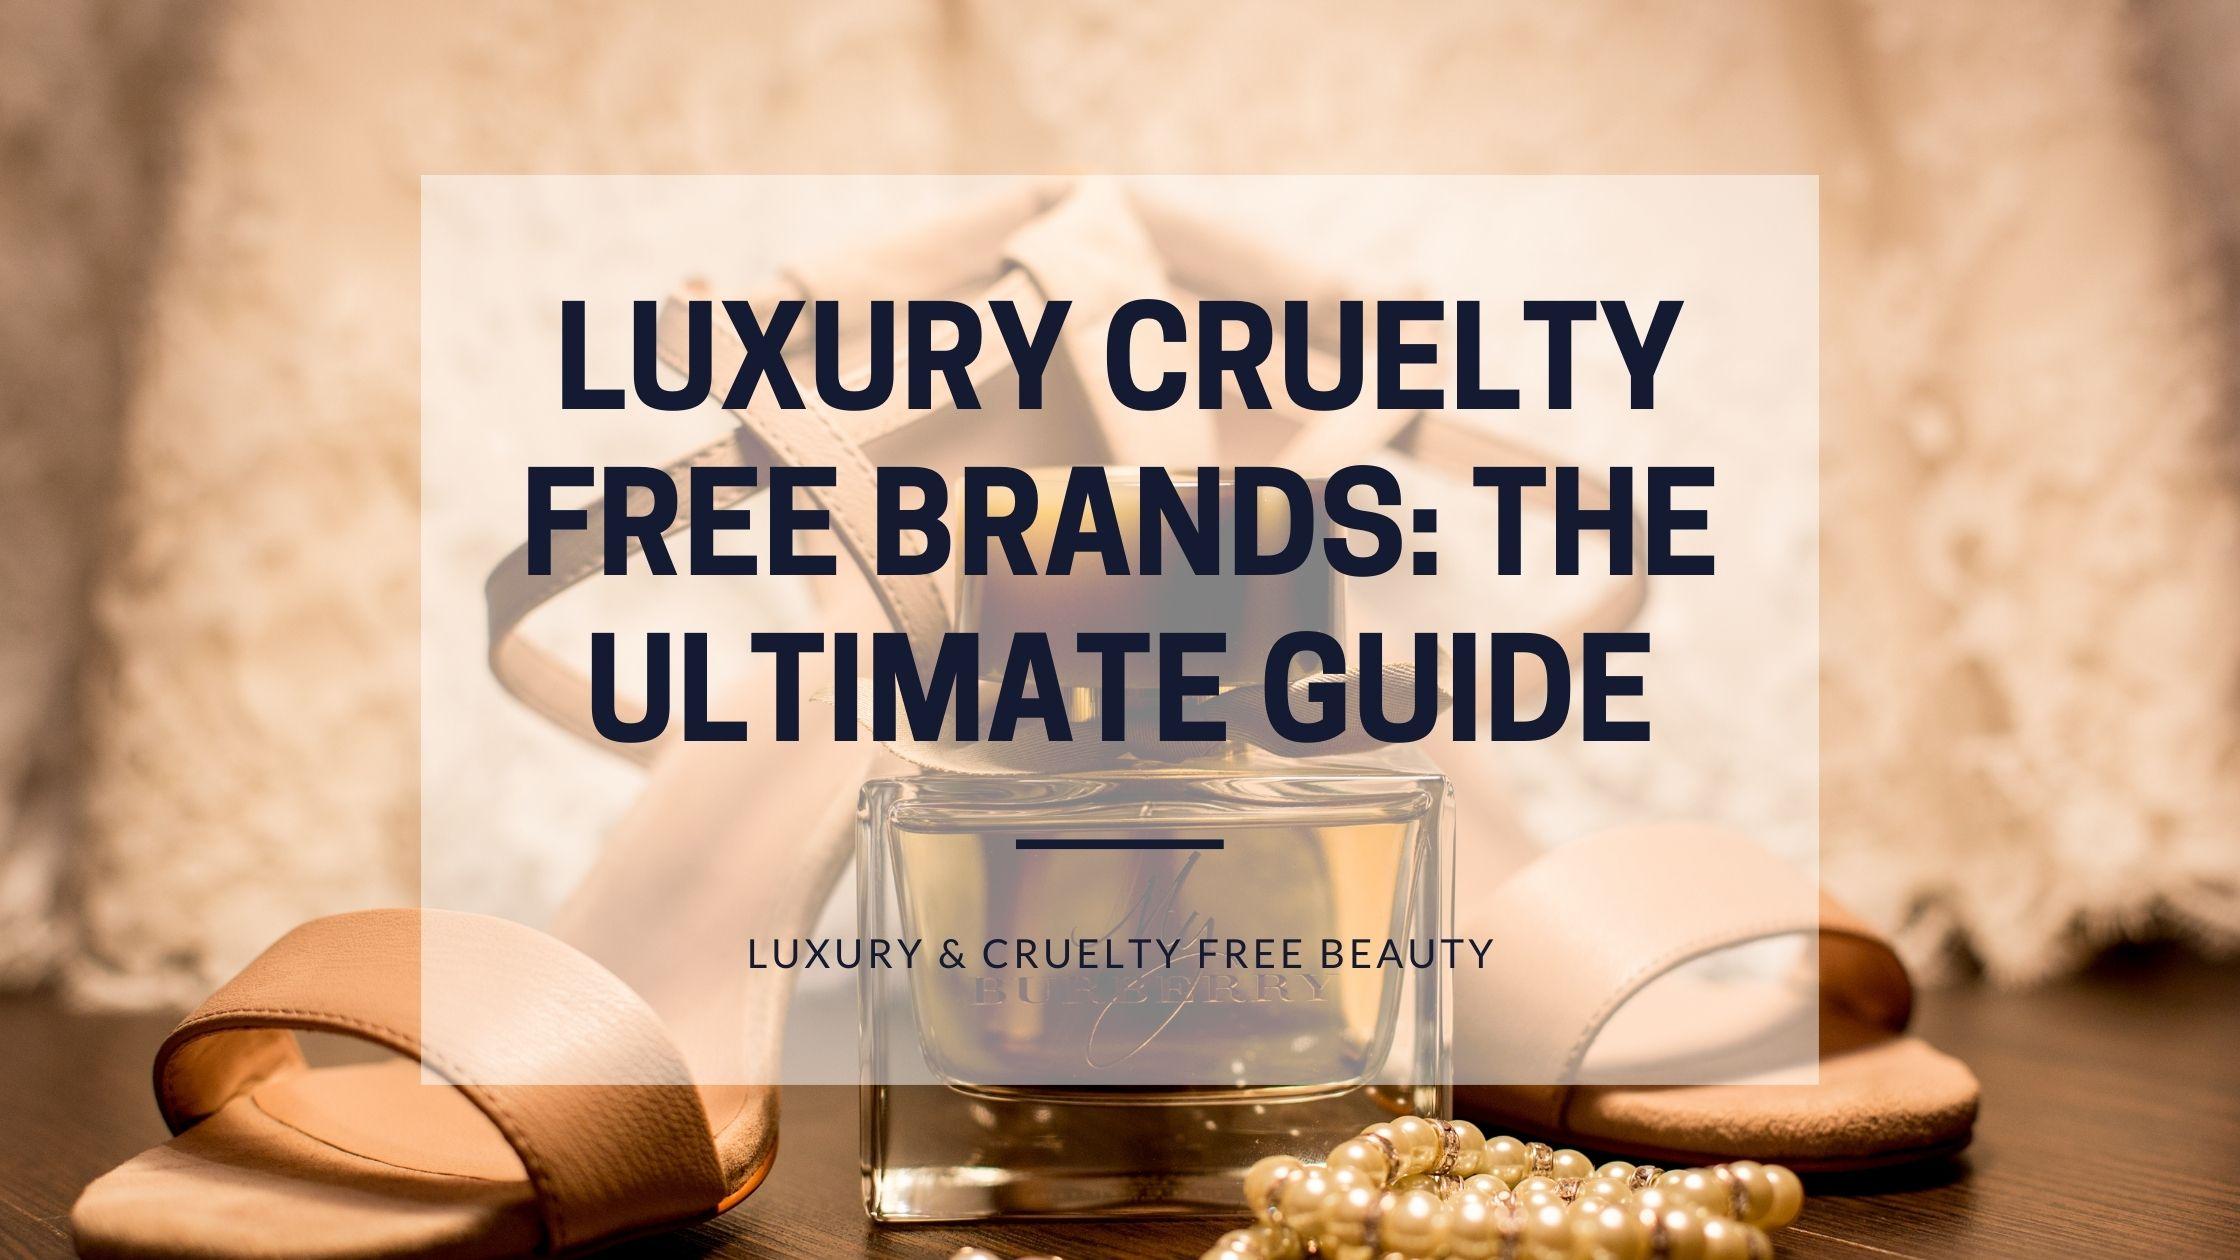 luxury cruelty free brands featured image